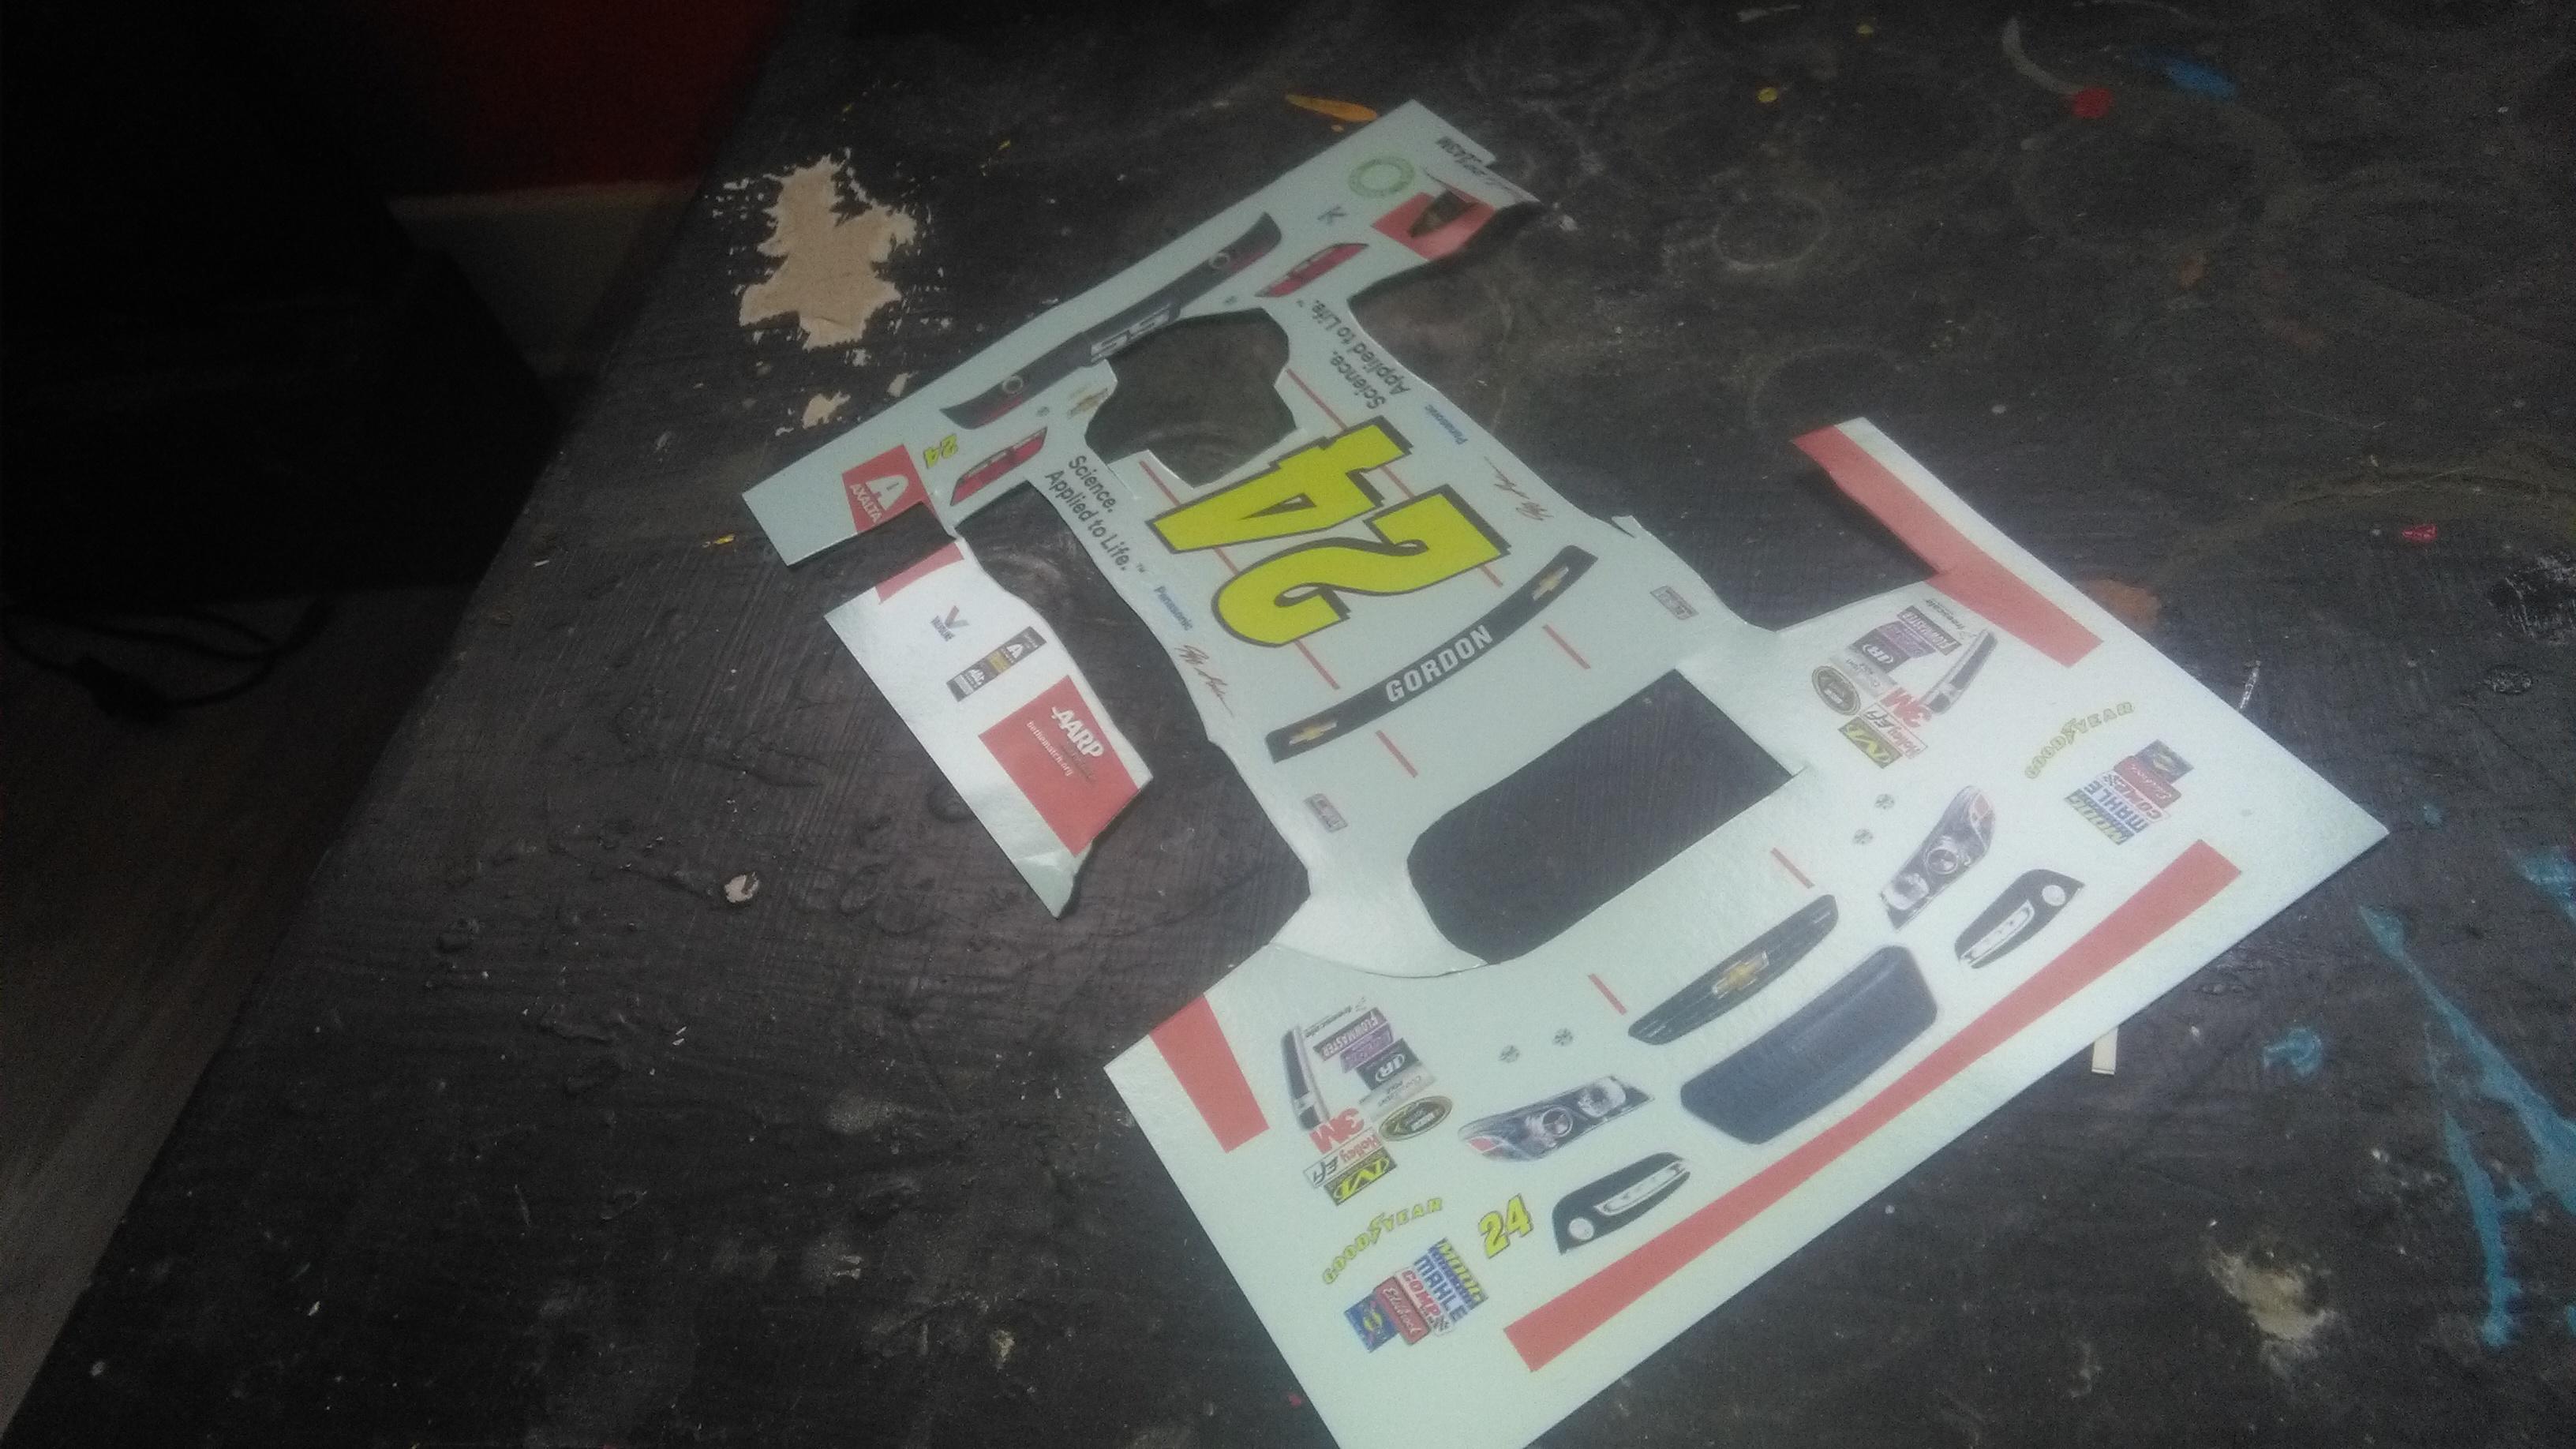 Chevrolet SS 2015 #24 Jeff Gordon 3M 843448IMG20170320152250